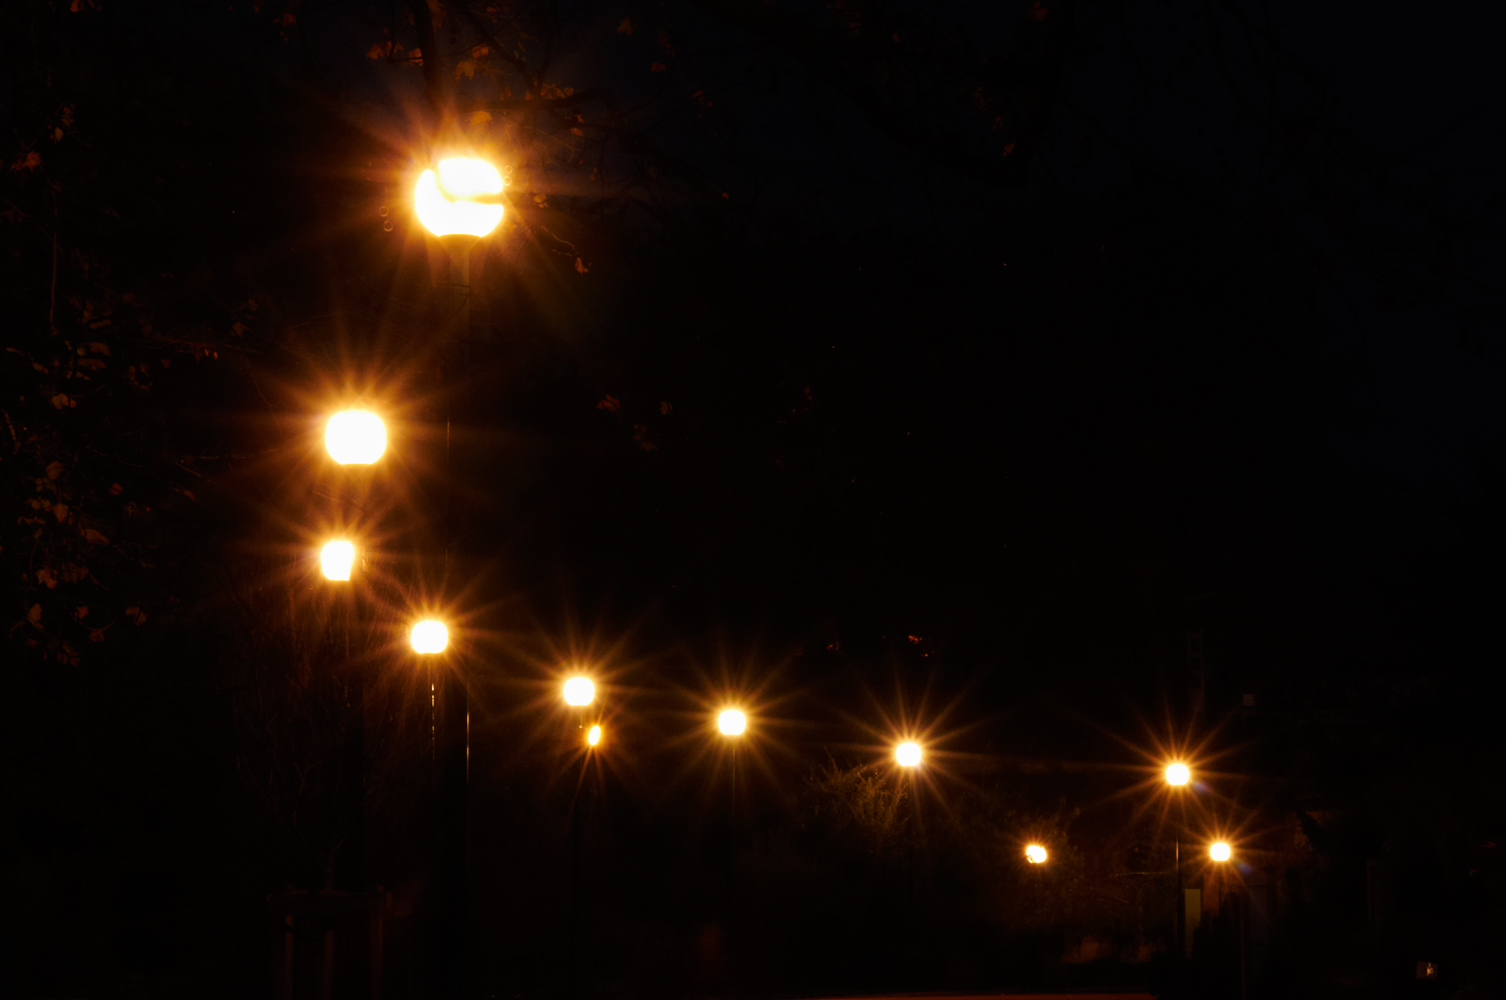 Night Lights – lumières nocturnes